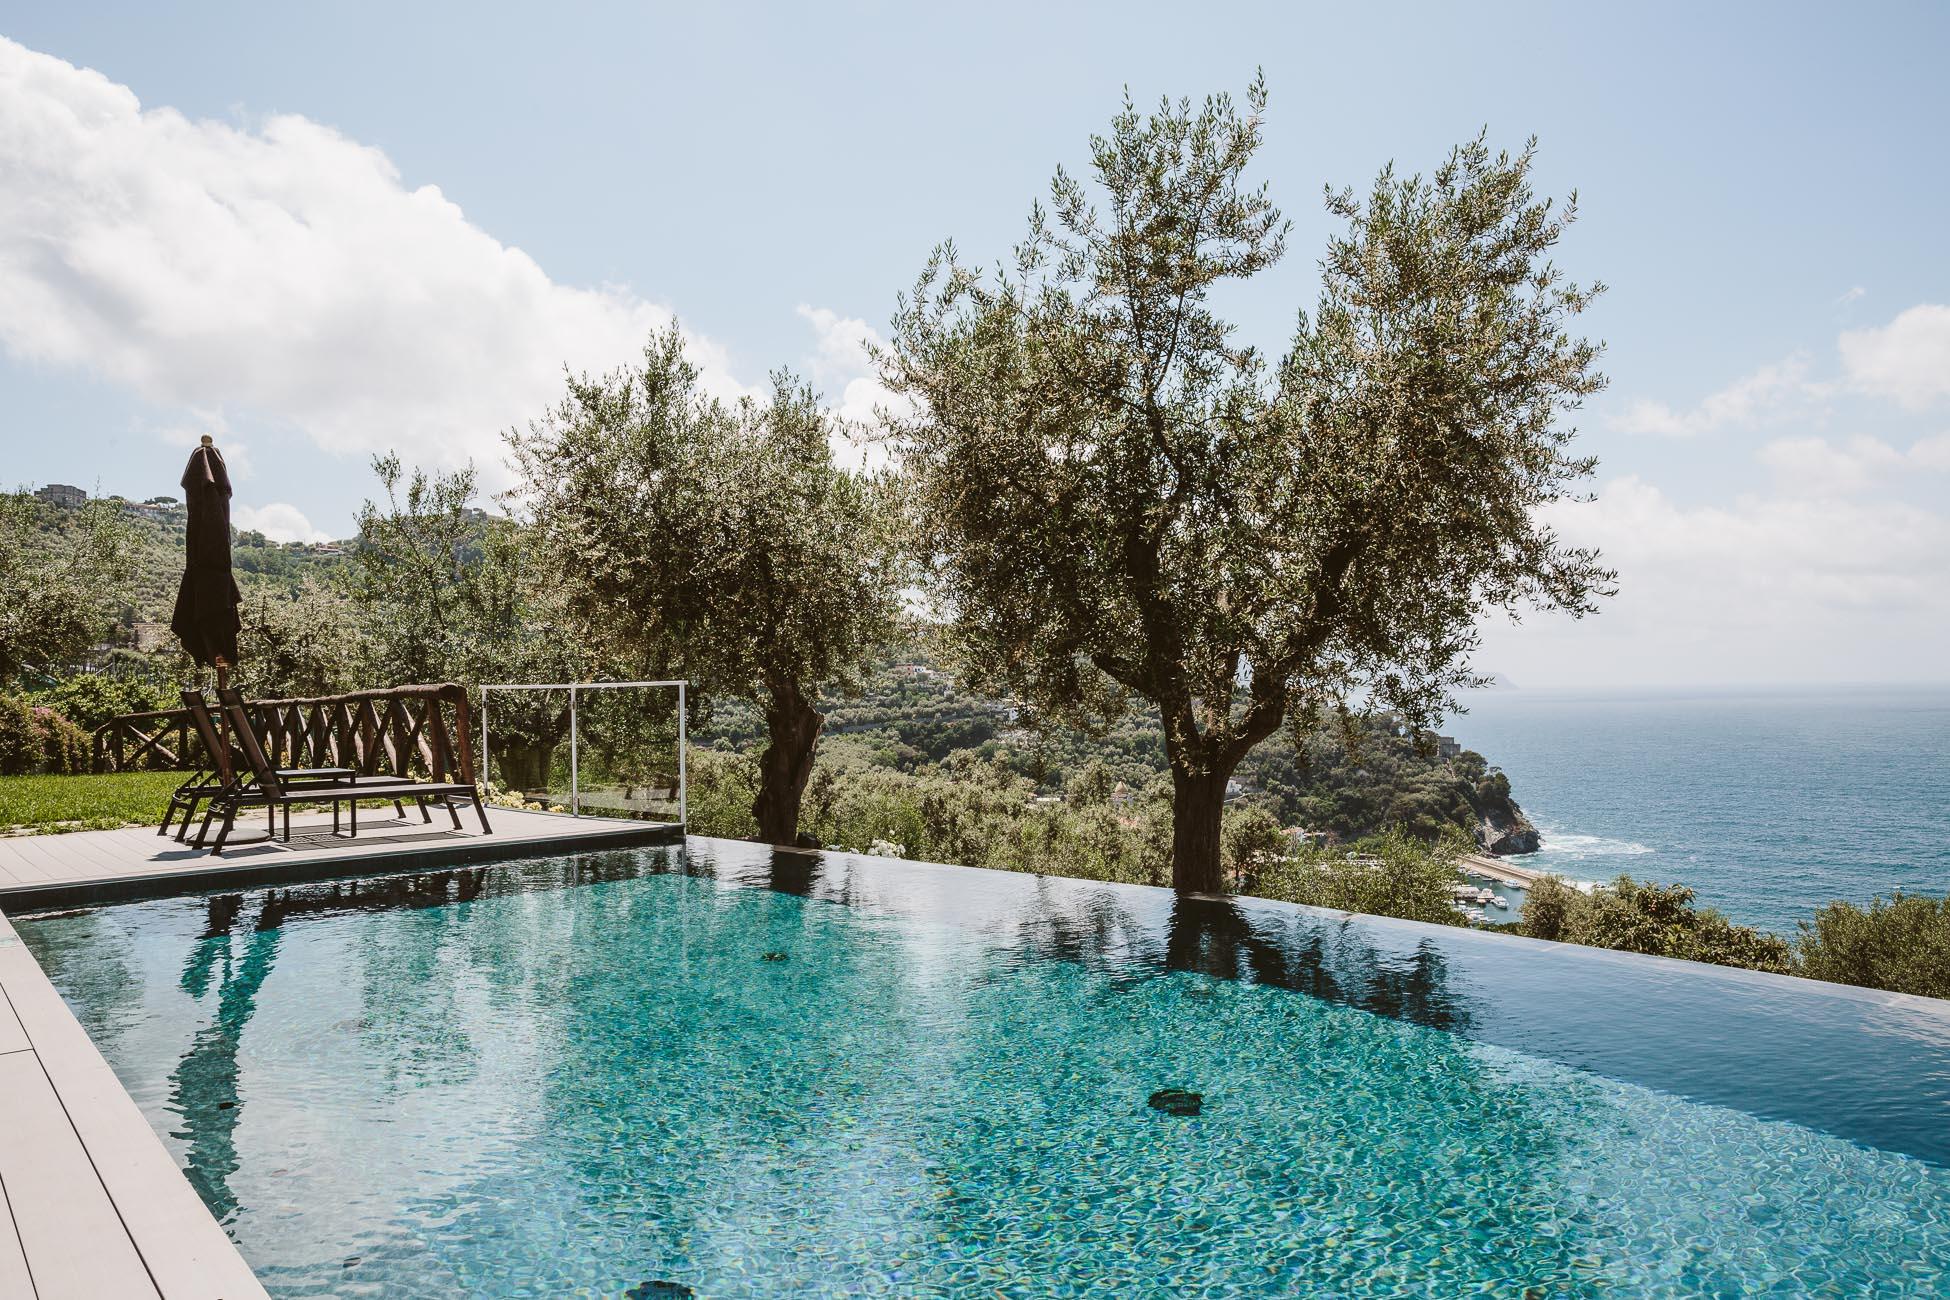 Infinity Pool at Art Hotel Villa Fiorella in Massa Lubrense